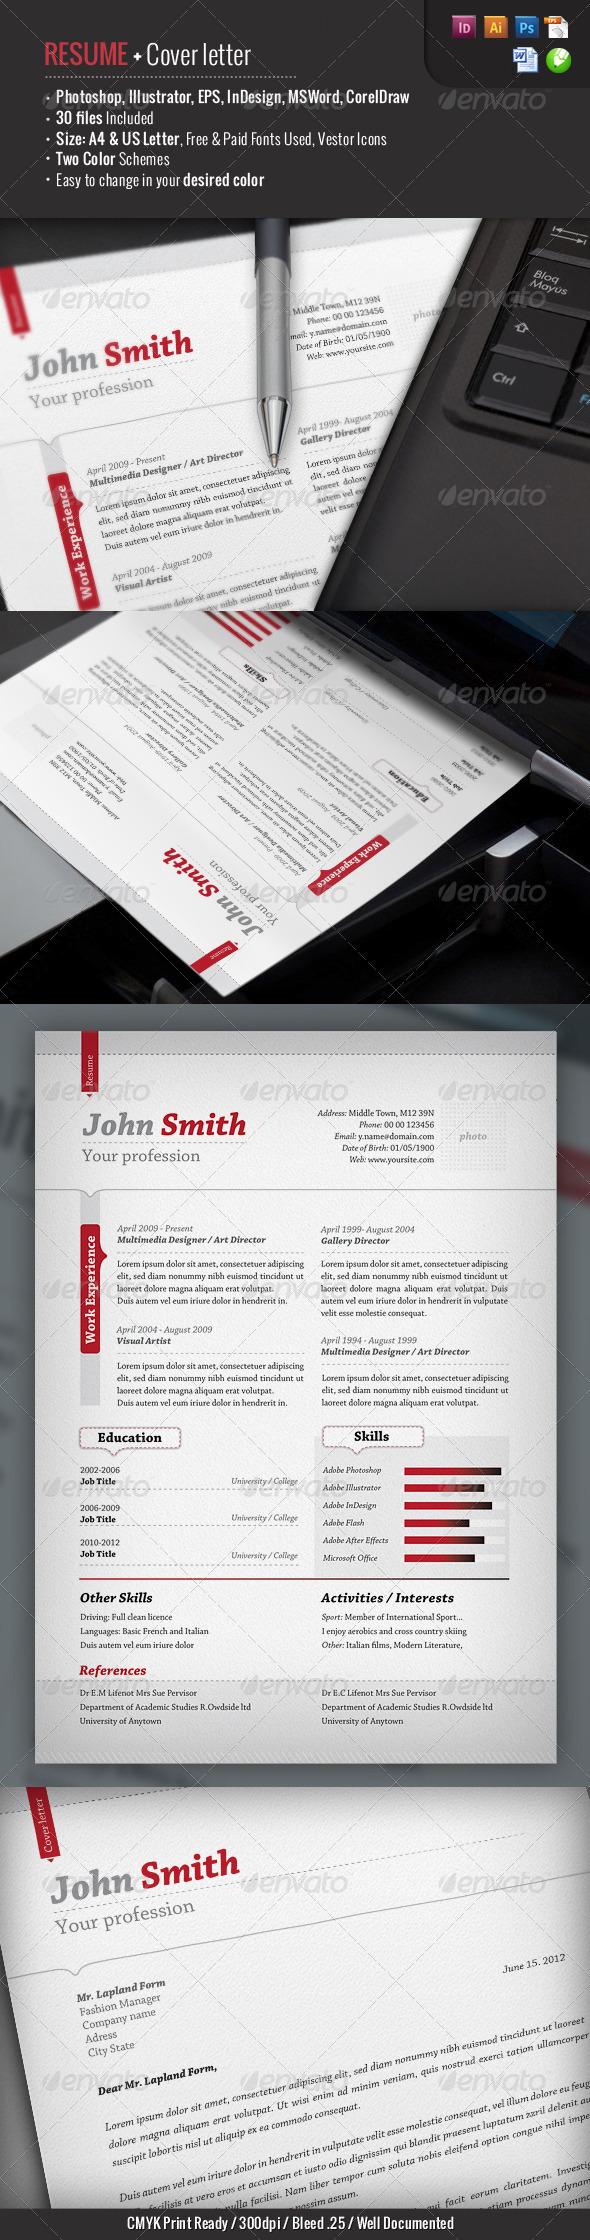 best resume font mac